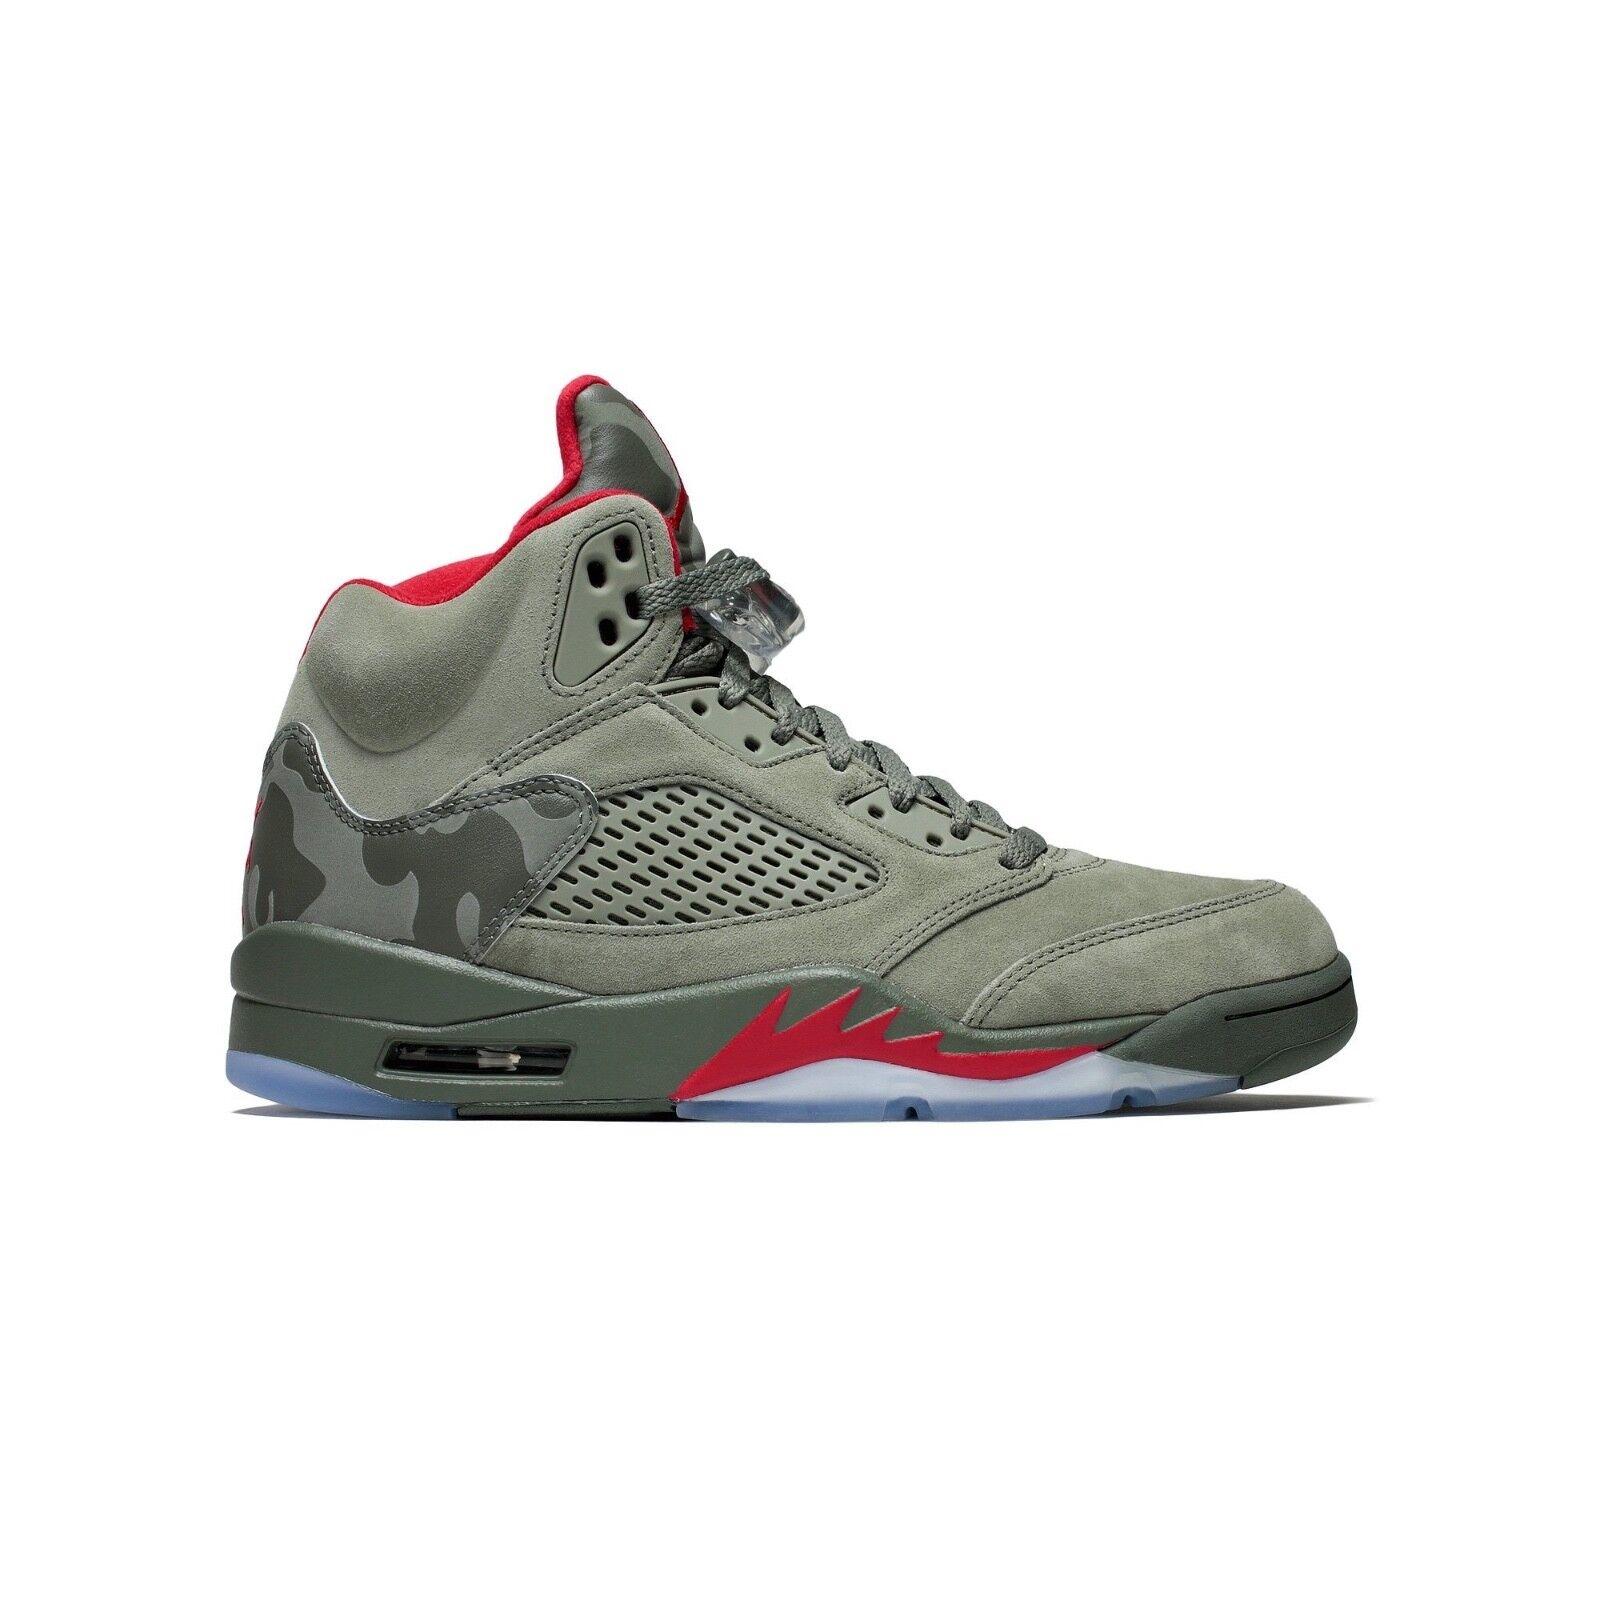 Hombre Nike Air Jordan Retro 5 Camo Air Nike Athletic tenis informales de moda 136027 051 386c71